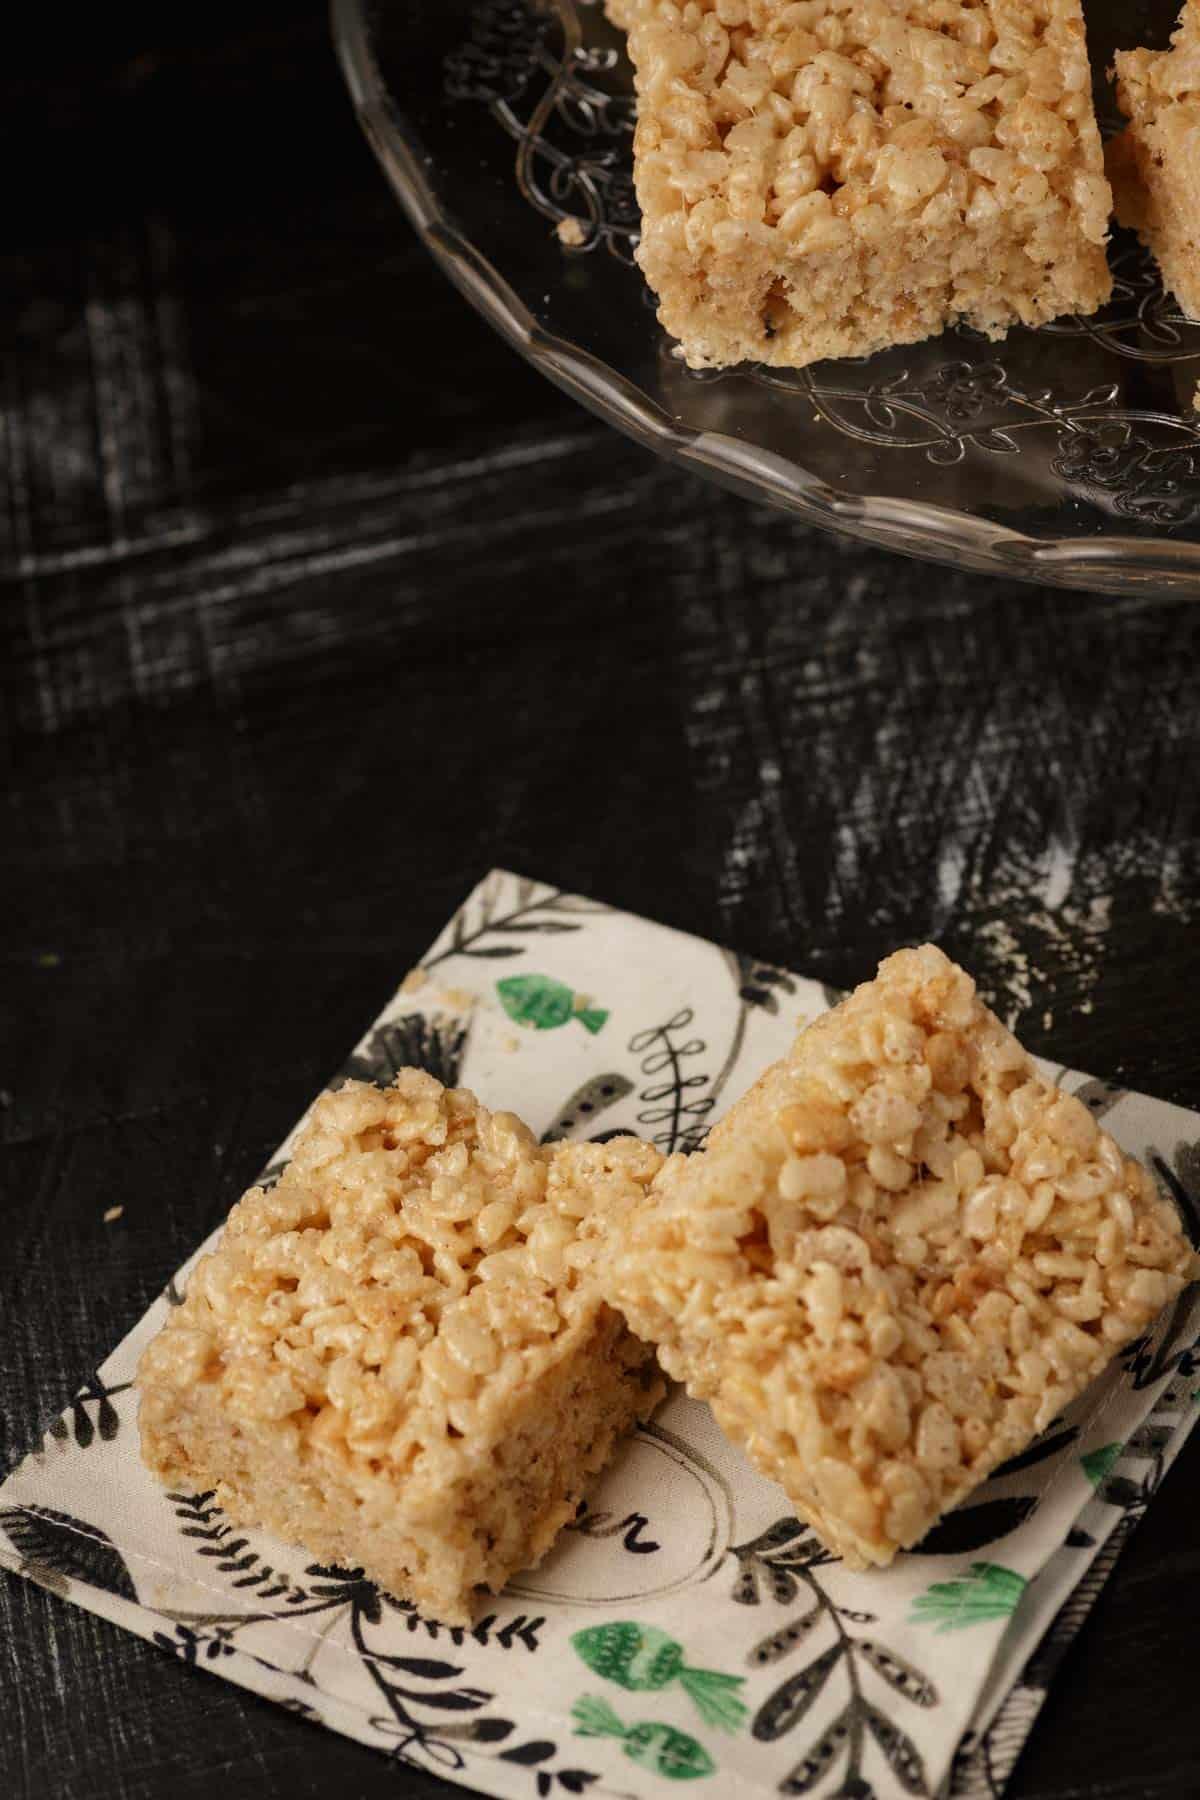 Two Rice Krispie treats on a cloth napkin.